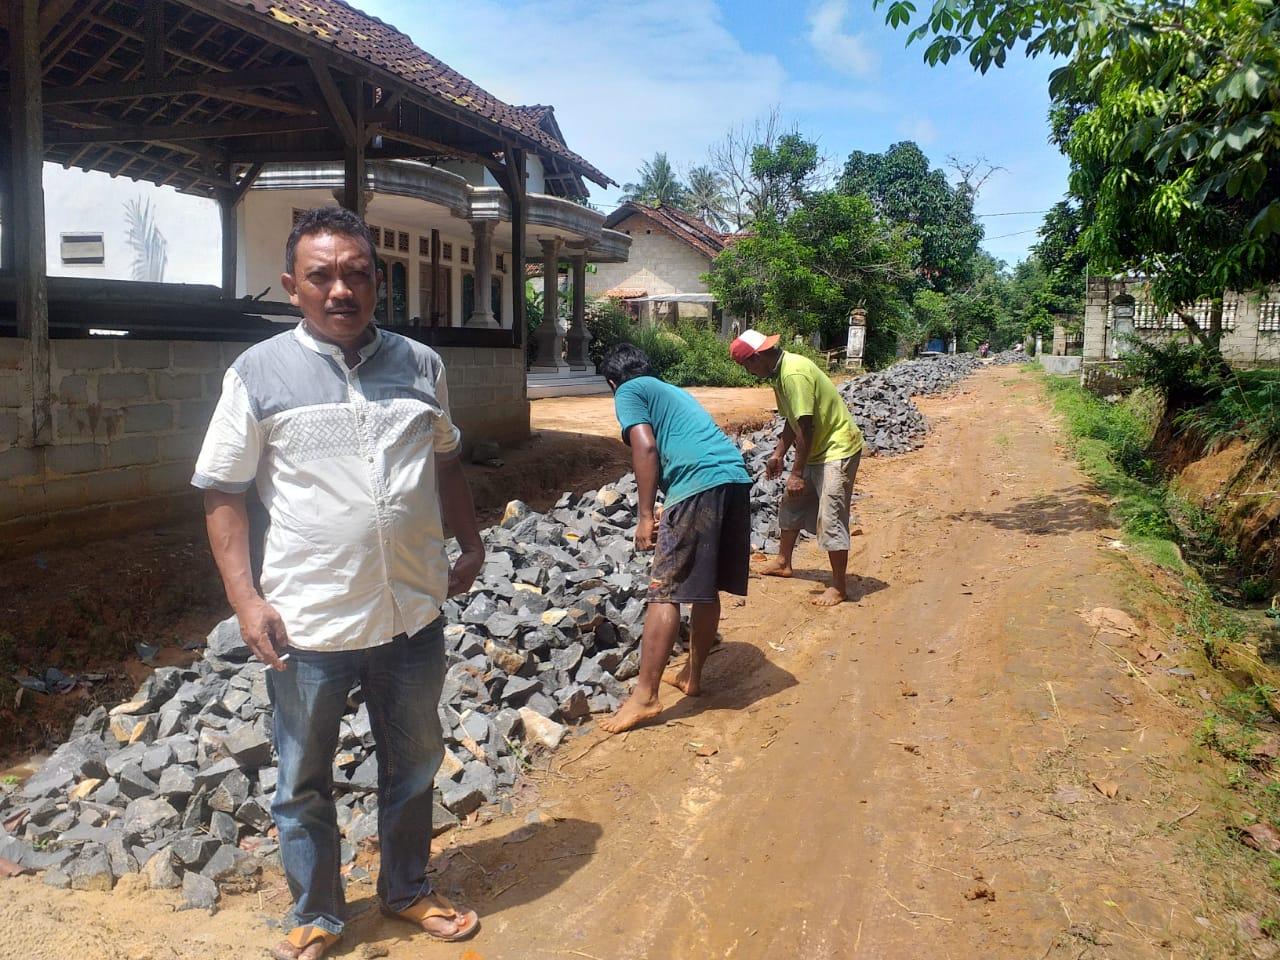 Kampung uman agung bangun jalan onderlag 1500 Meter Dan TPT 75 Meter